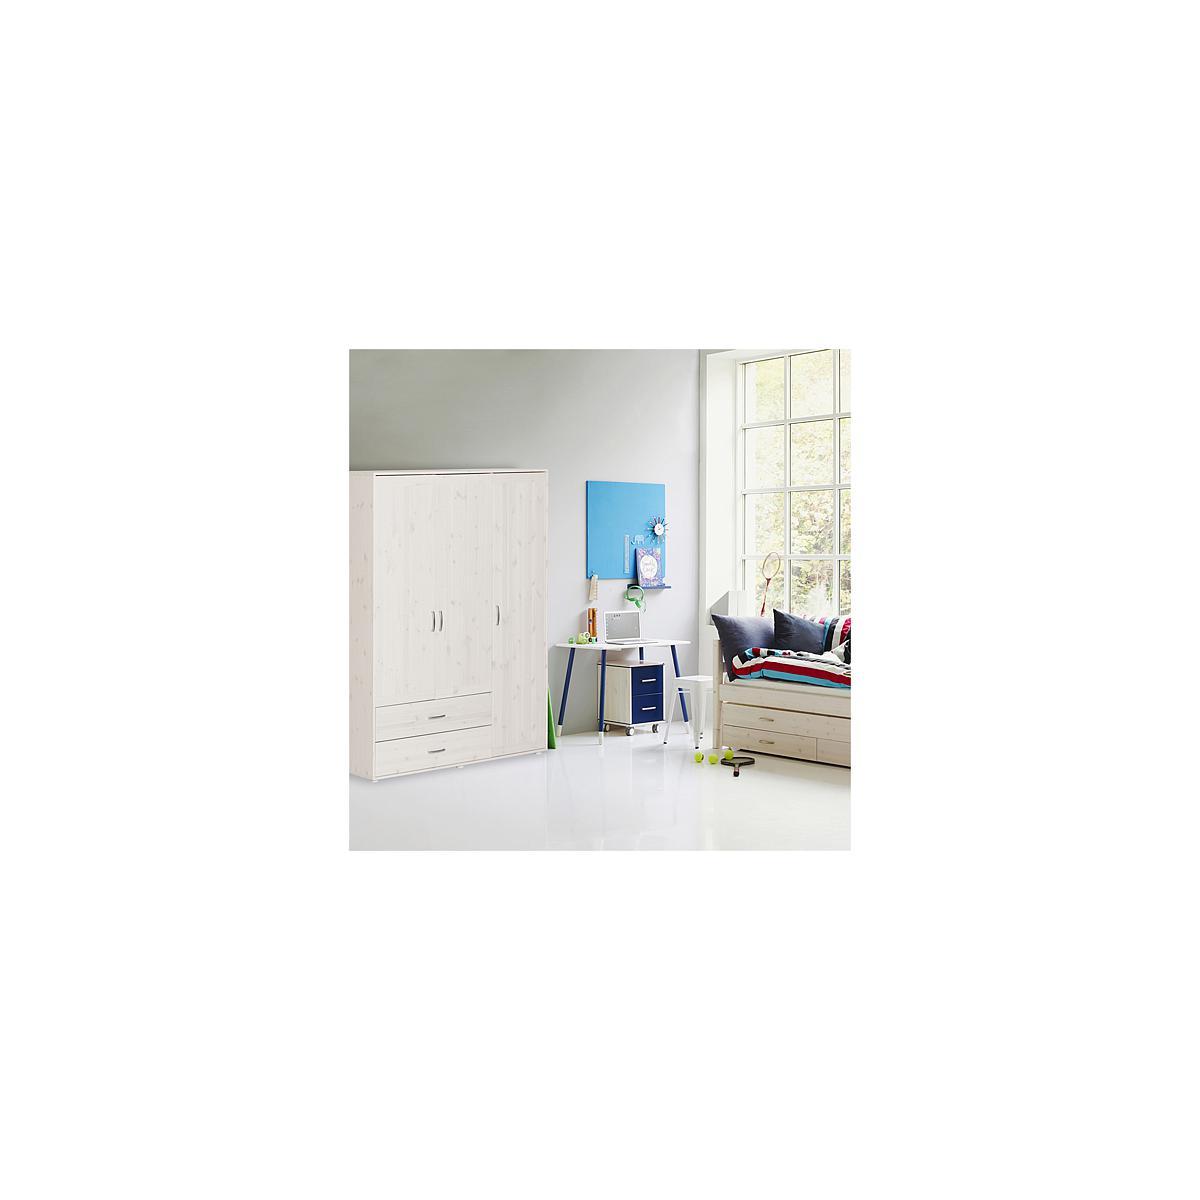 Armario infantil extra alto 3 puertas 2 cajones 4 estantes 2 barras NEW CLASSIC Flexa blanco cal - blanco cal - blanco